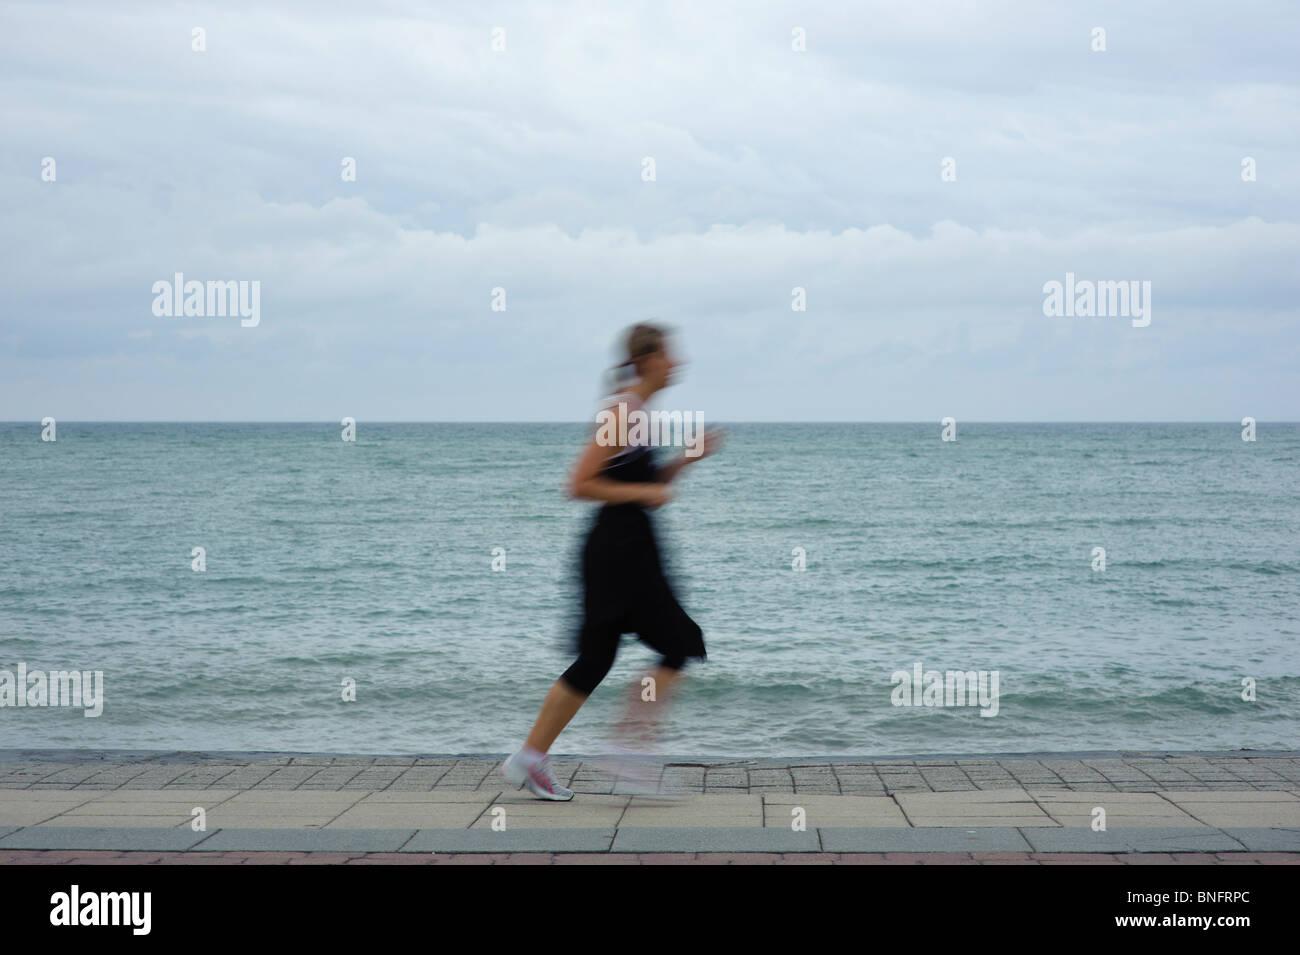 Bewegungsunschärfe, Frau Jogger jogging Läufer laufen durch das Meer Meer bewölkten grauen Tag UK Stockbild